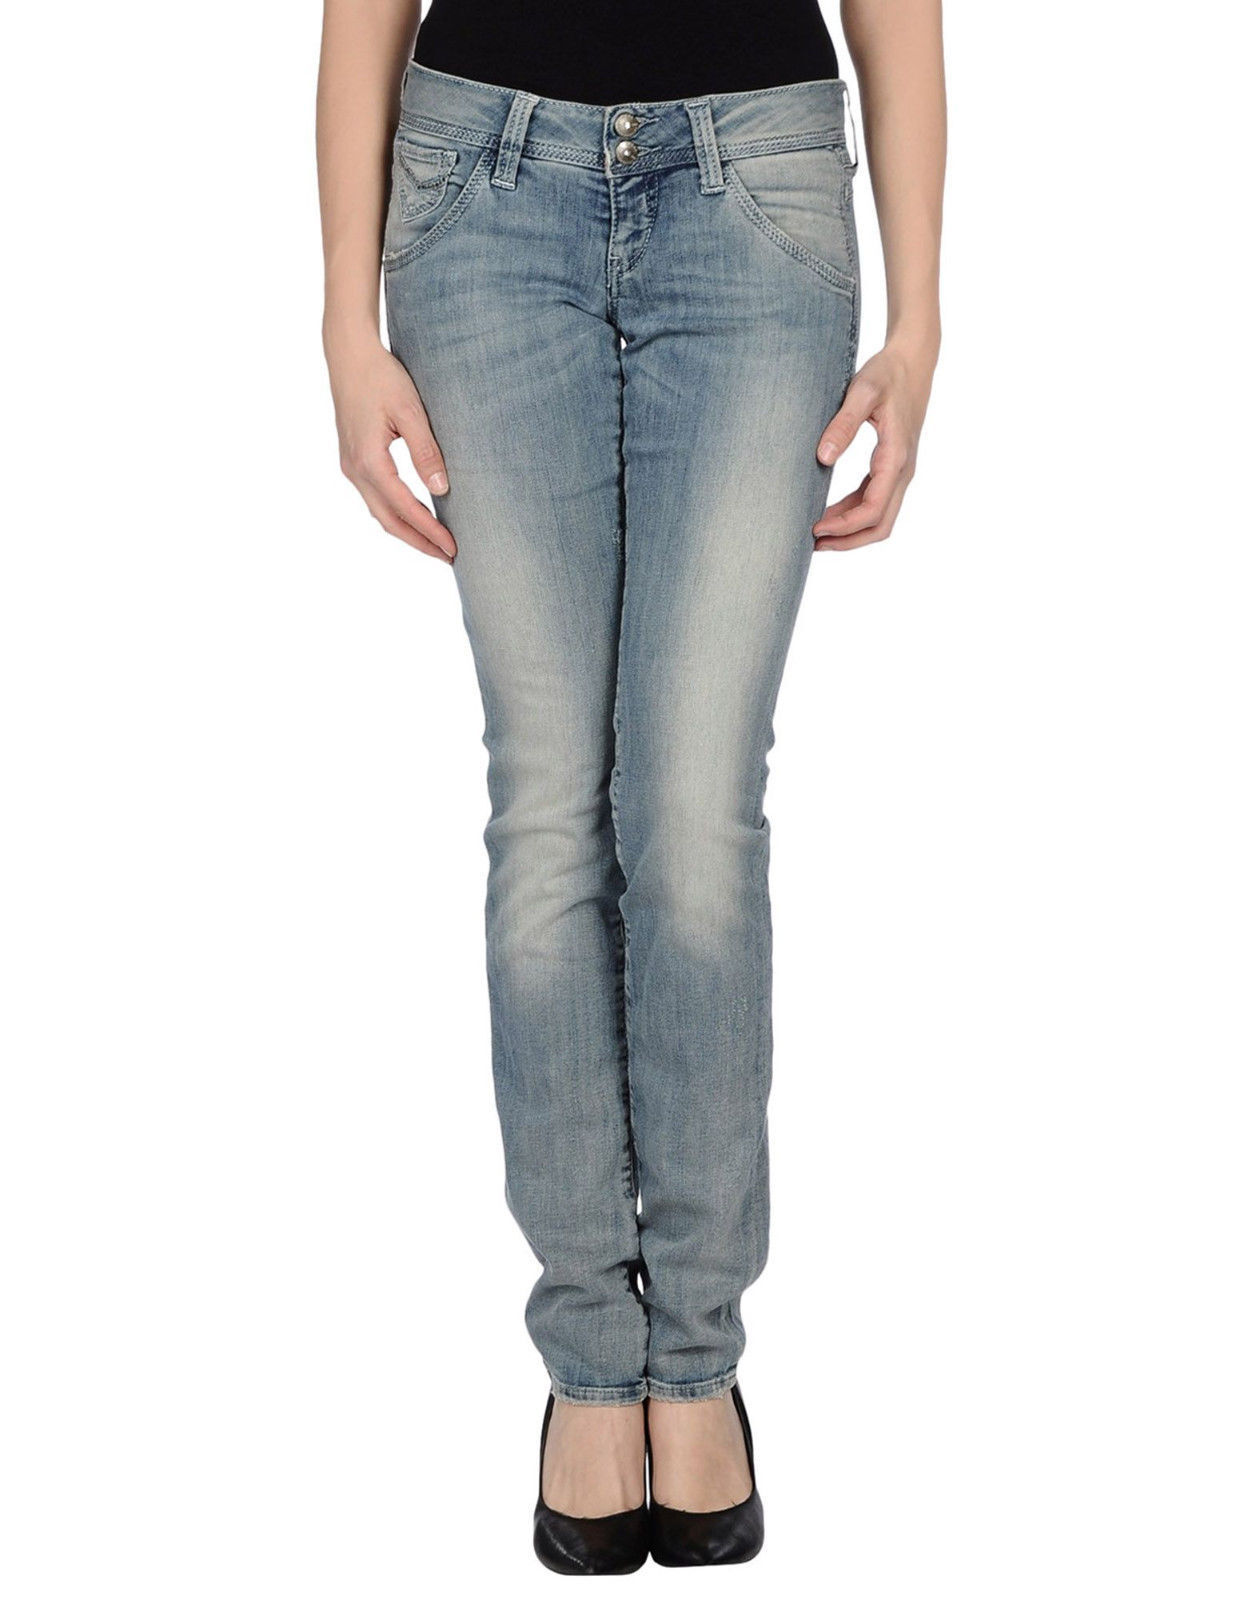 NWT GUESS Rhinestones Jeans Slim Fit Low Rise bluee Denim Pants Size 27